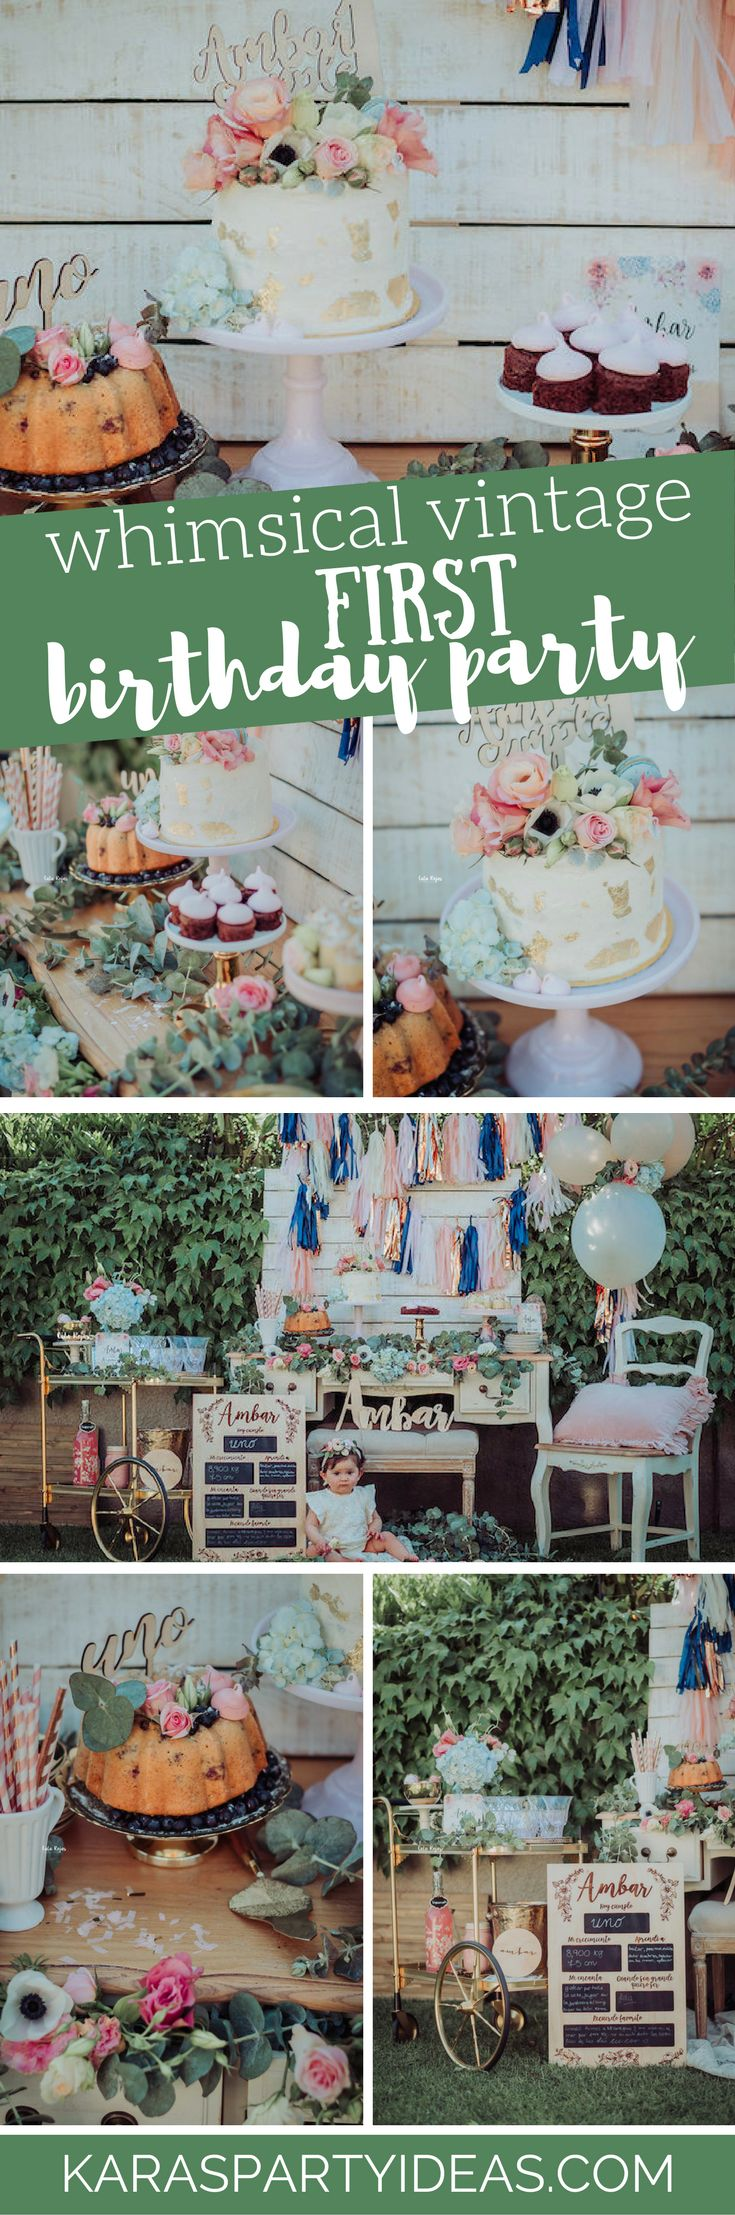 Whimsical Vintage 1st Birthday Party via Kara's Party Ideas -  KarasPartyIdeas.com